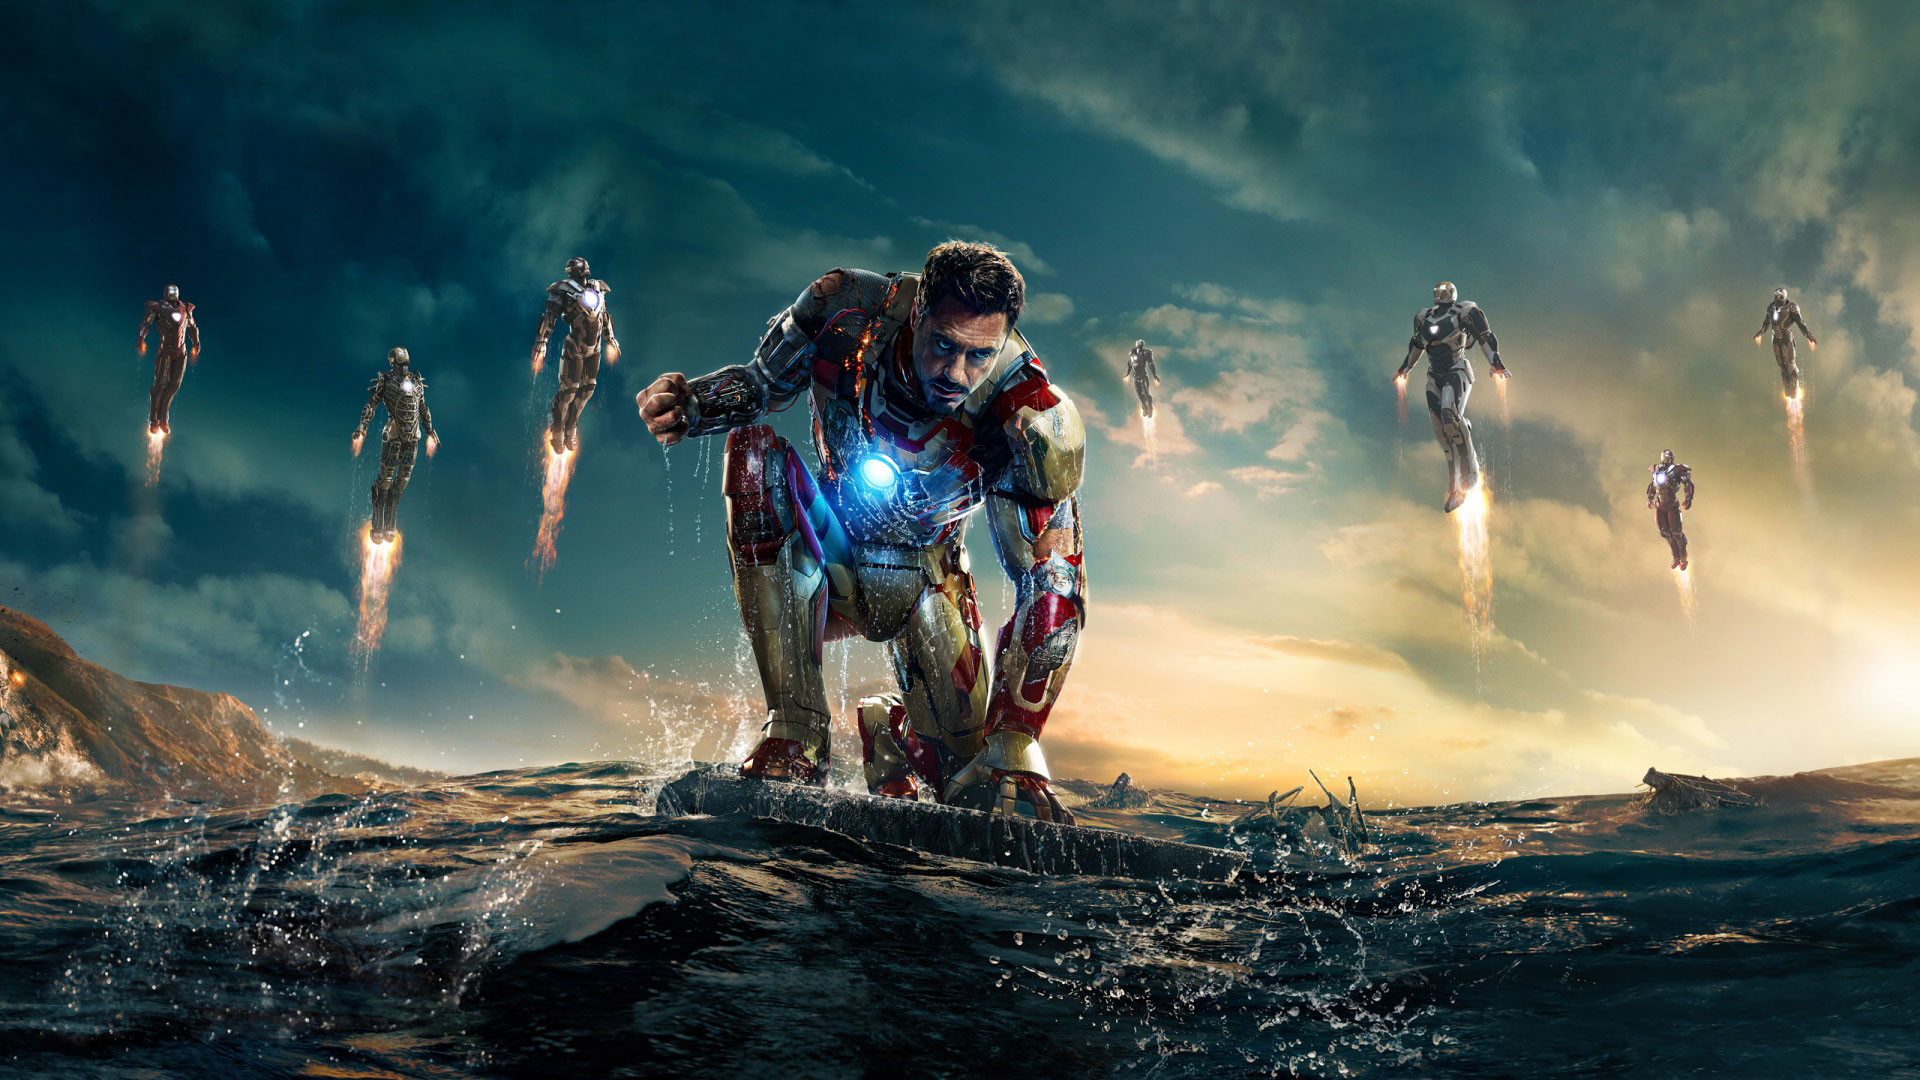 … action iron man 3 marvel live wallpaper 1080p hd image …